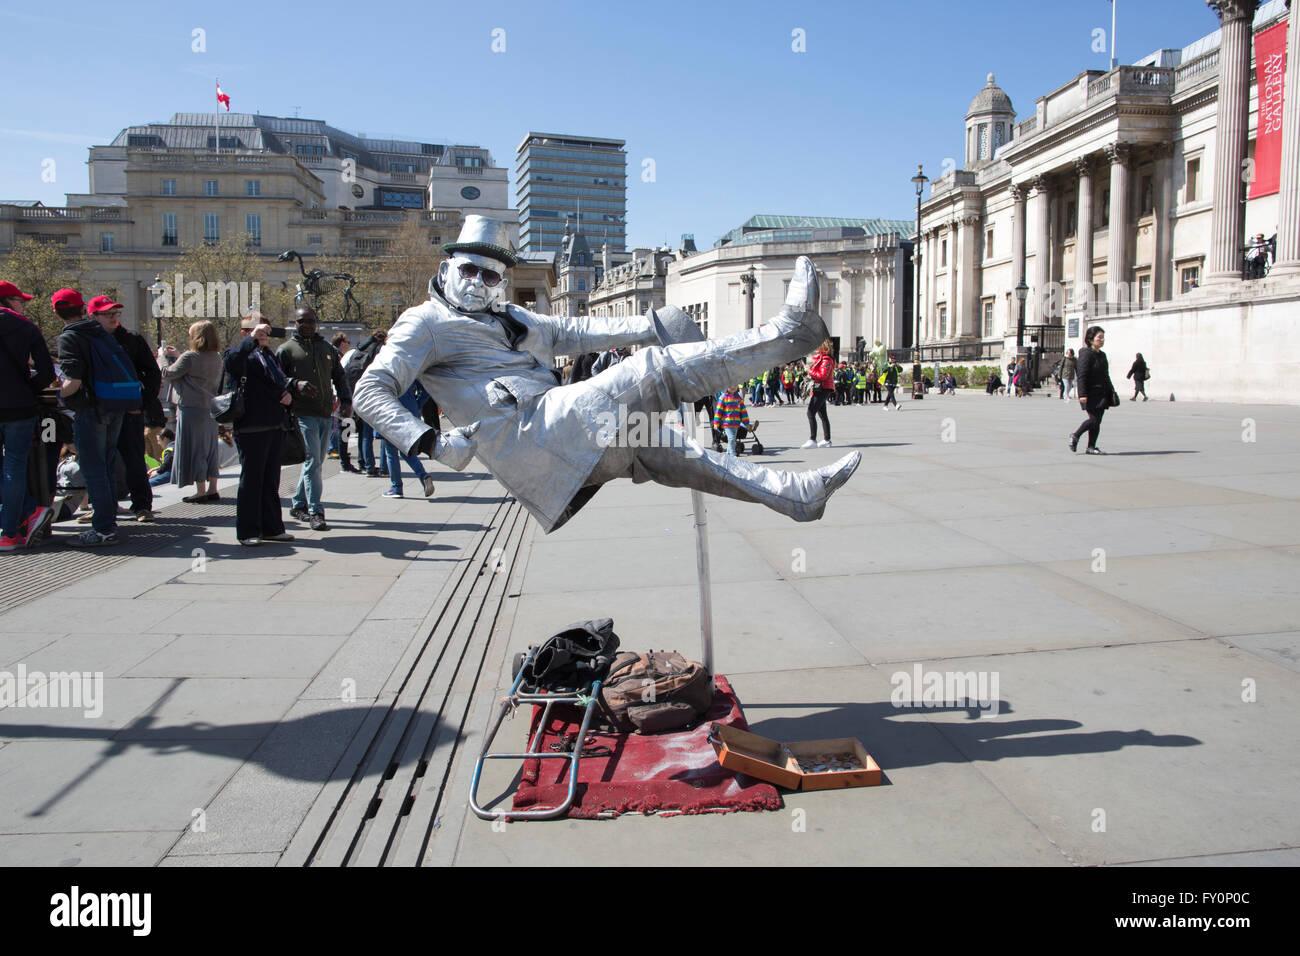 Levitating street entertainer in Trafalgar Square, central London, UK - Stock Image